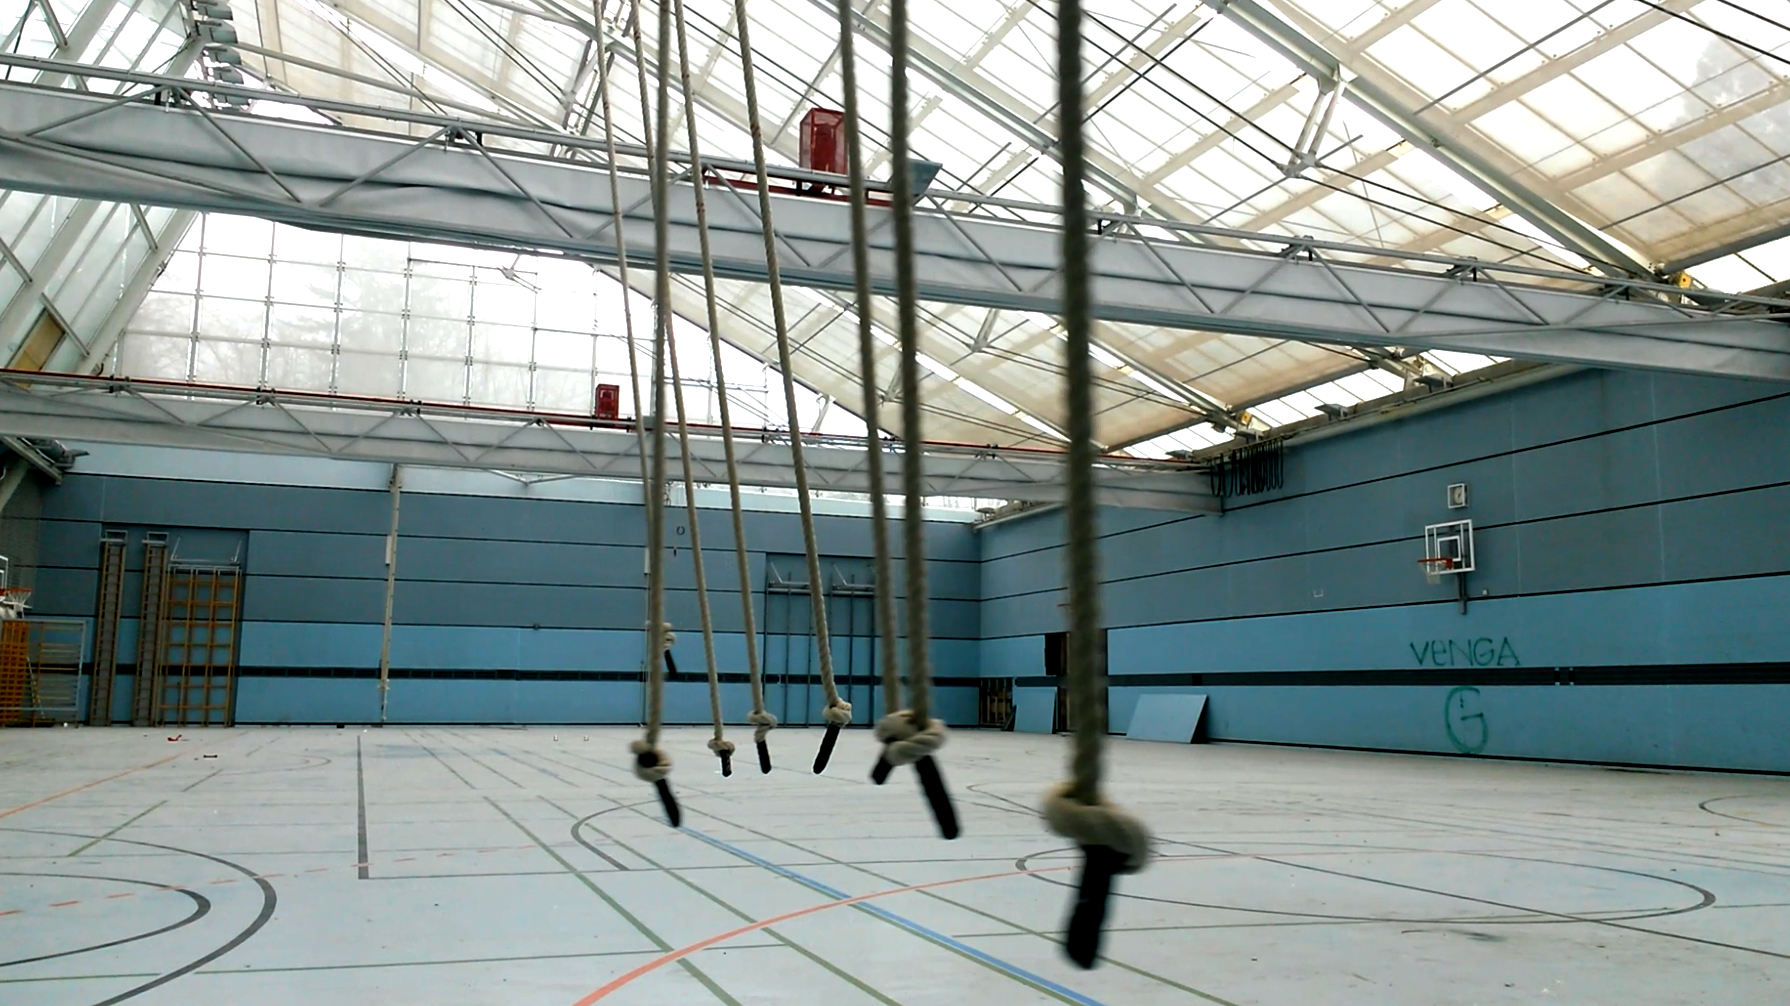 abbandoned gym